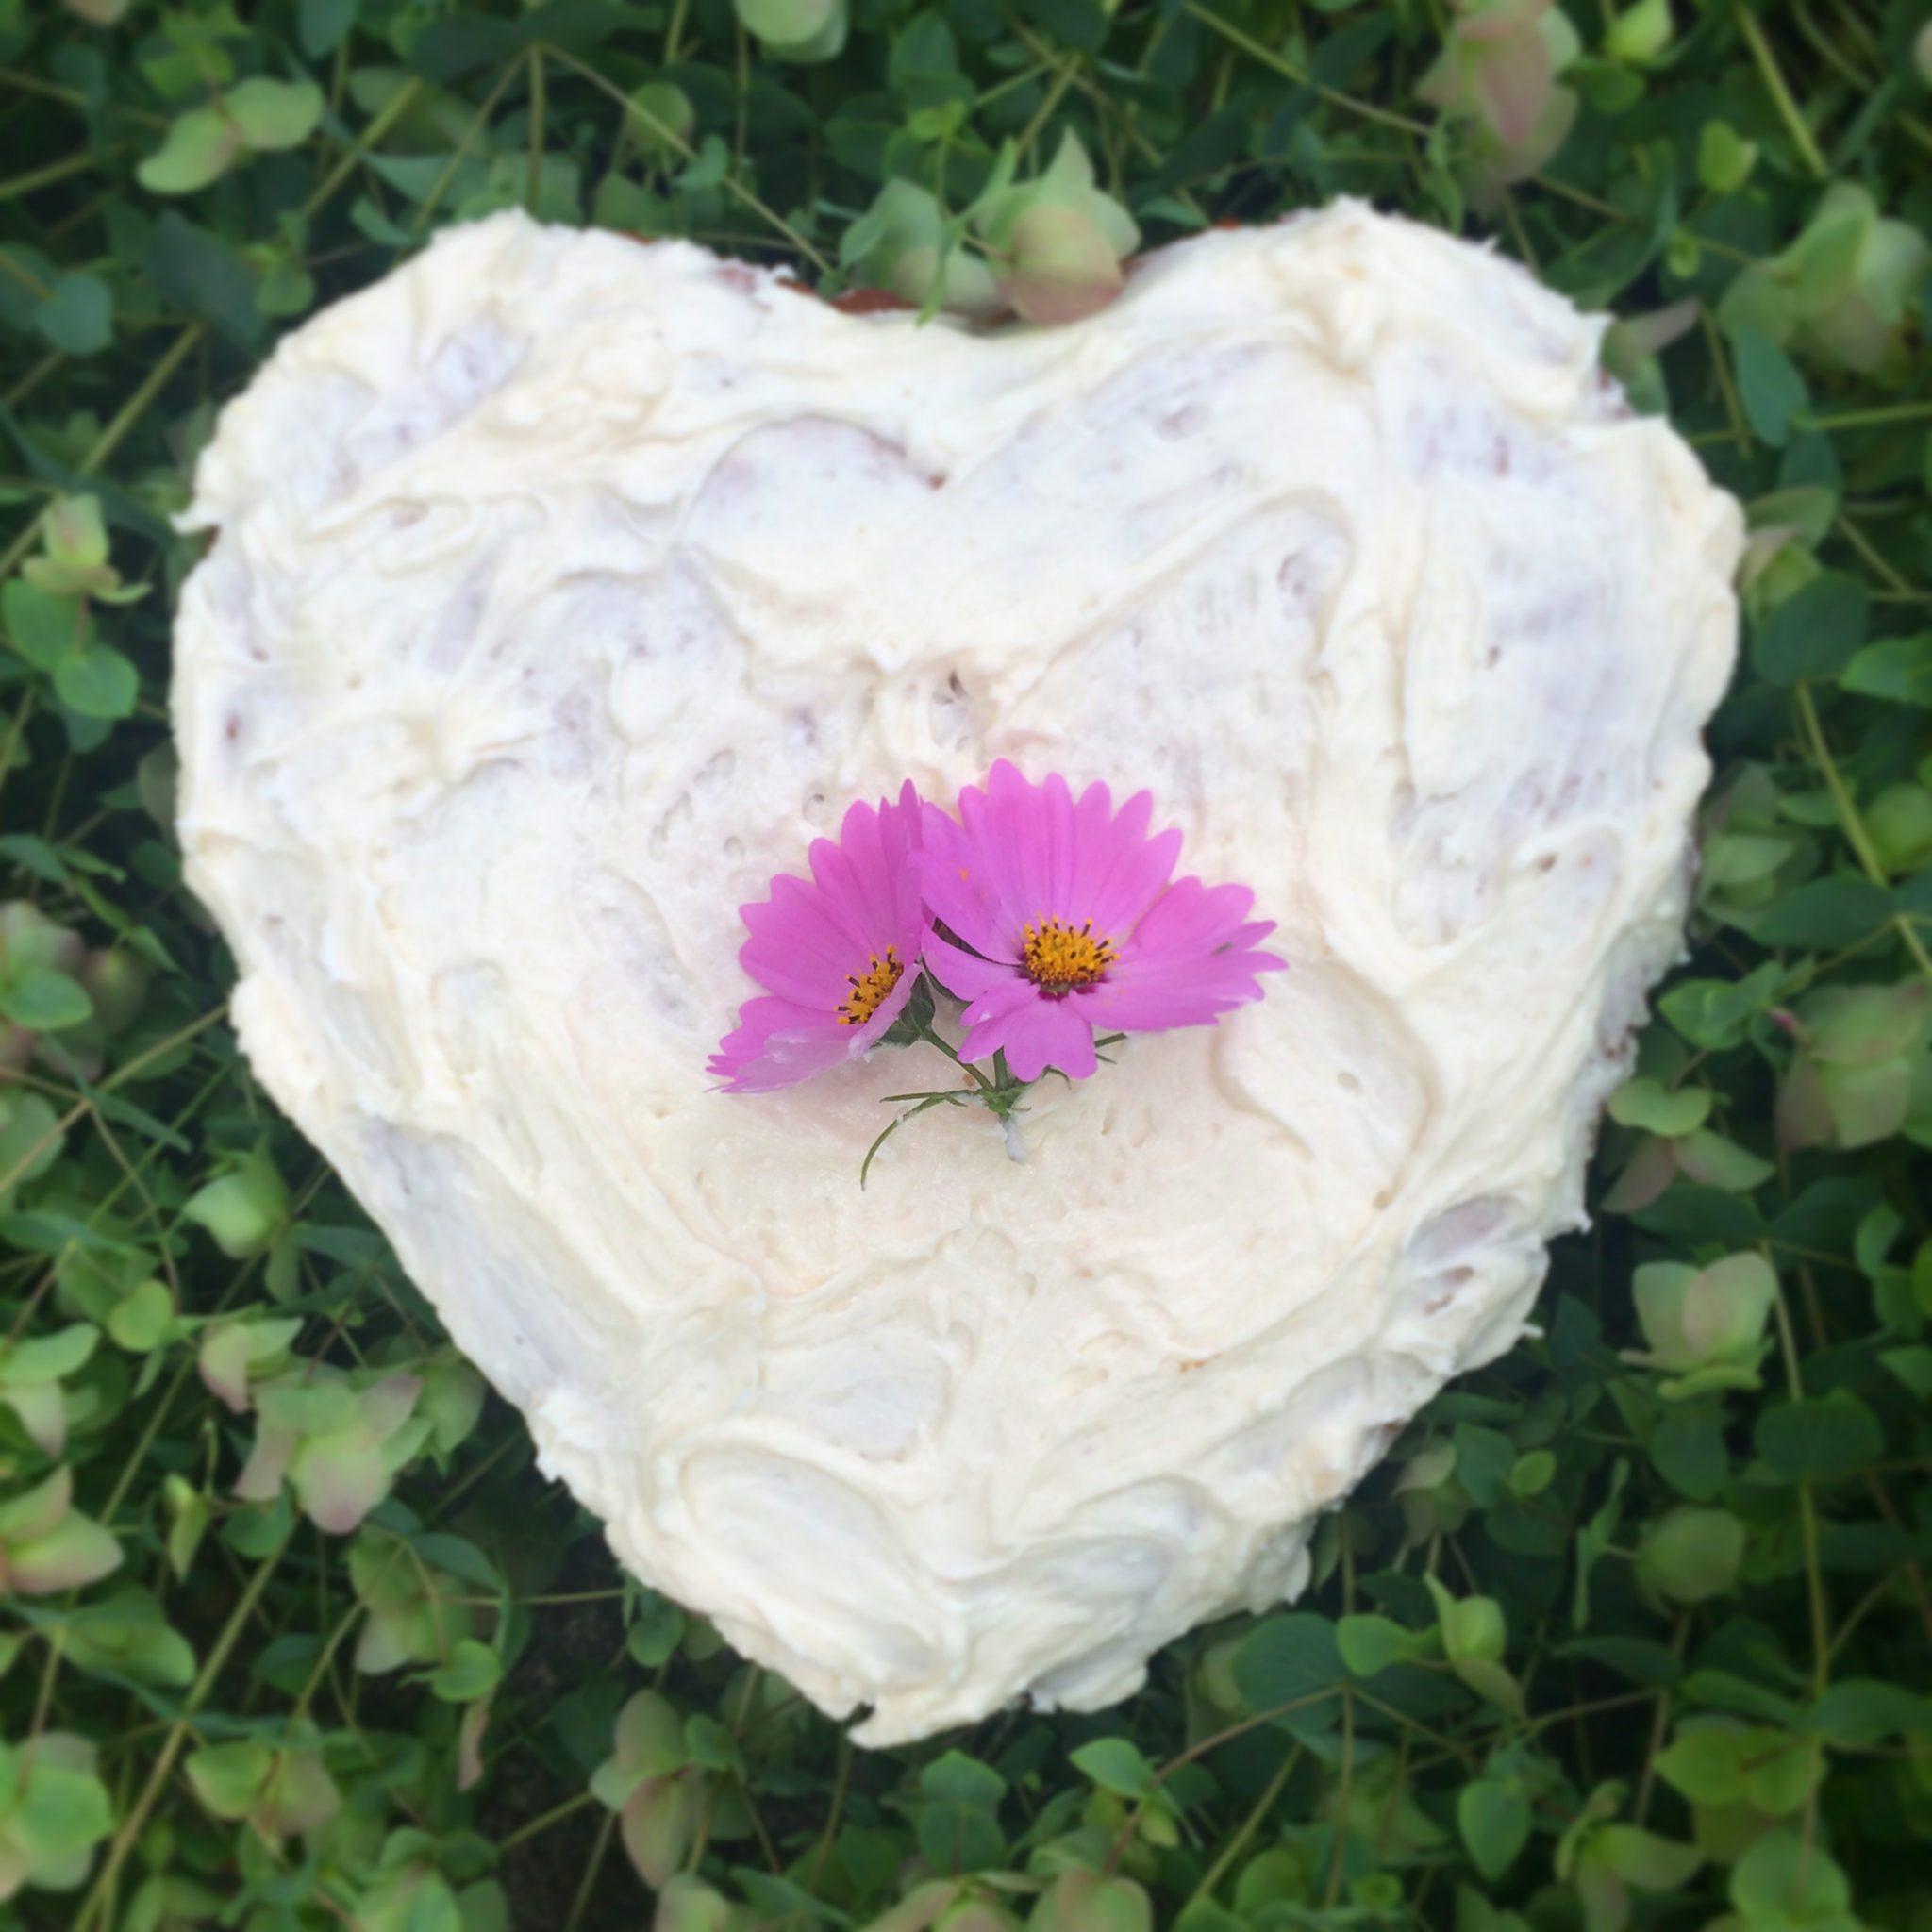 plum nelli homemade heart cake